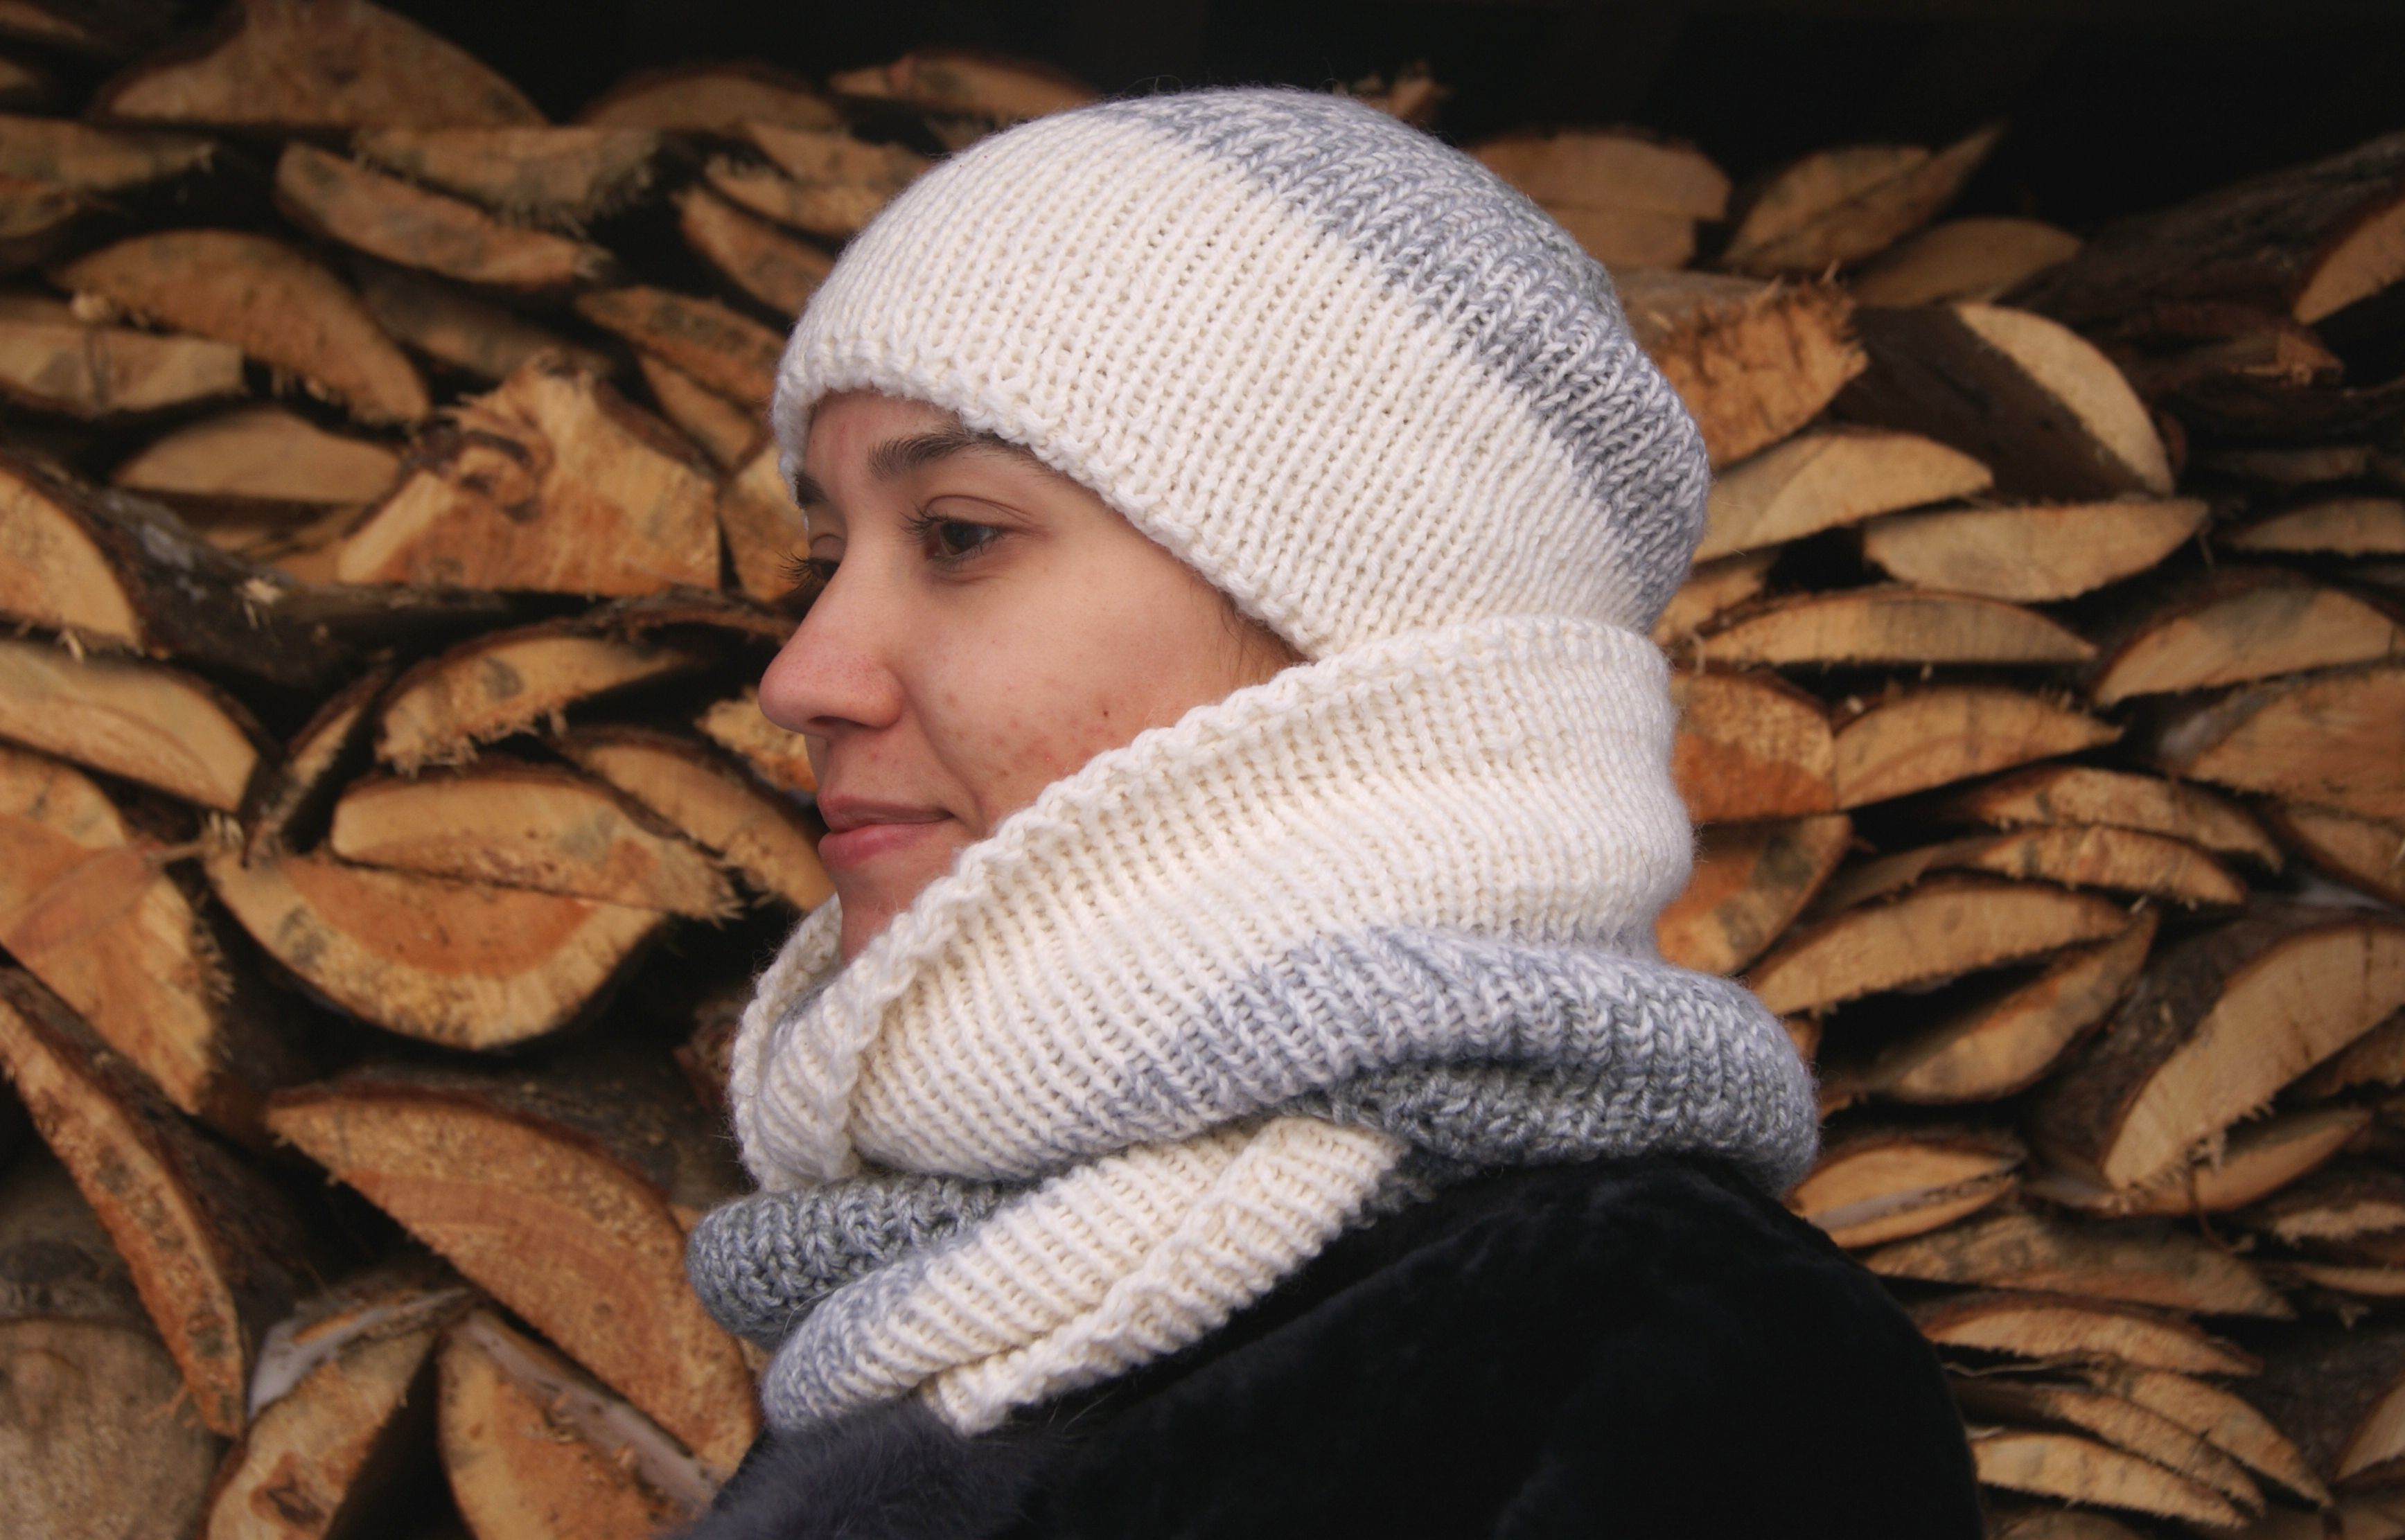 вязаниеназаказ вяжутнетолькобабушки вязаныйкомплект вяжуназаказ тепло уют зима шапкавязаныйснуд вязанаяшапкакомплектзимнийкомплект снуд вязание